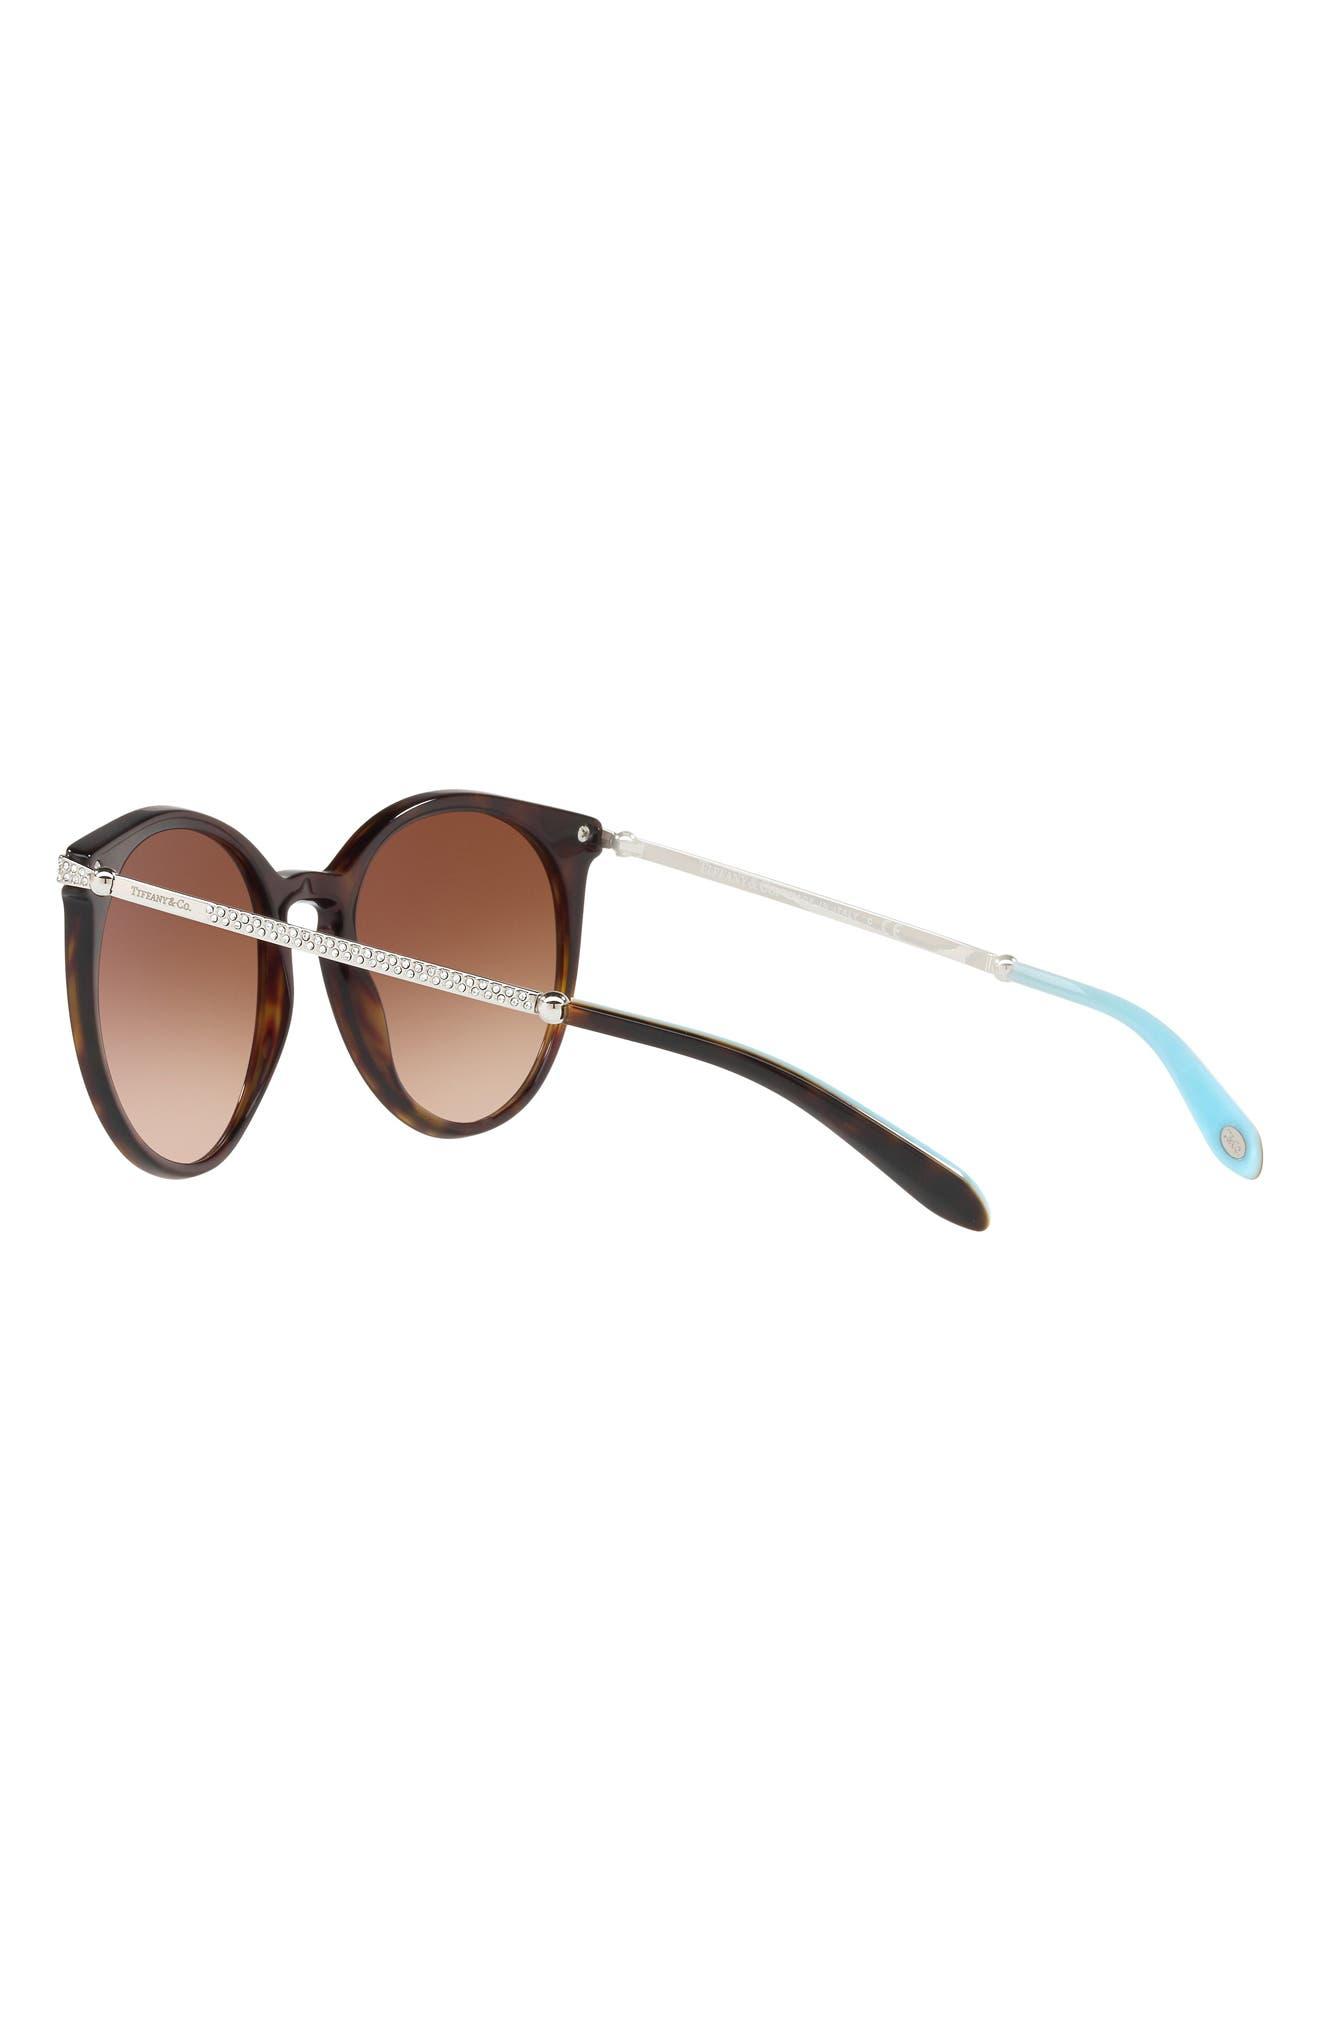 54mm Gradient Round Sunglasses,                             Alternate thumbnail 3, color,                             Dark Havana